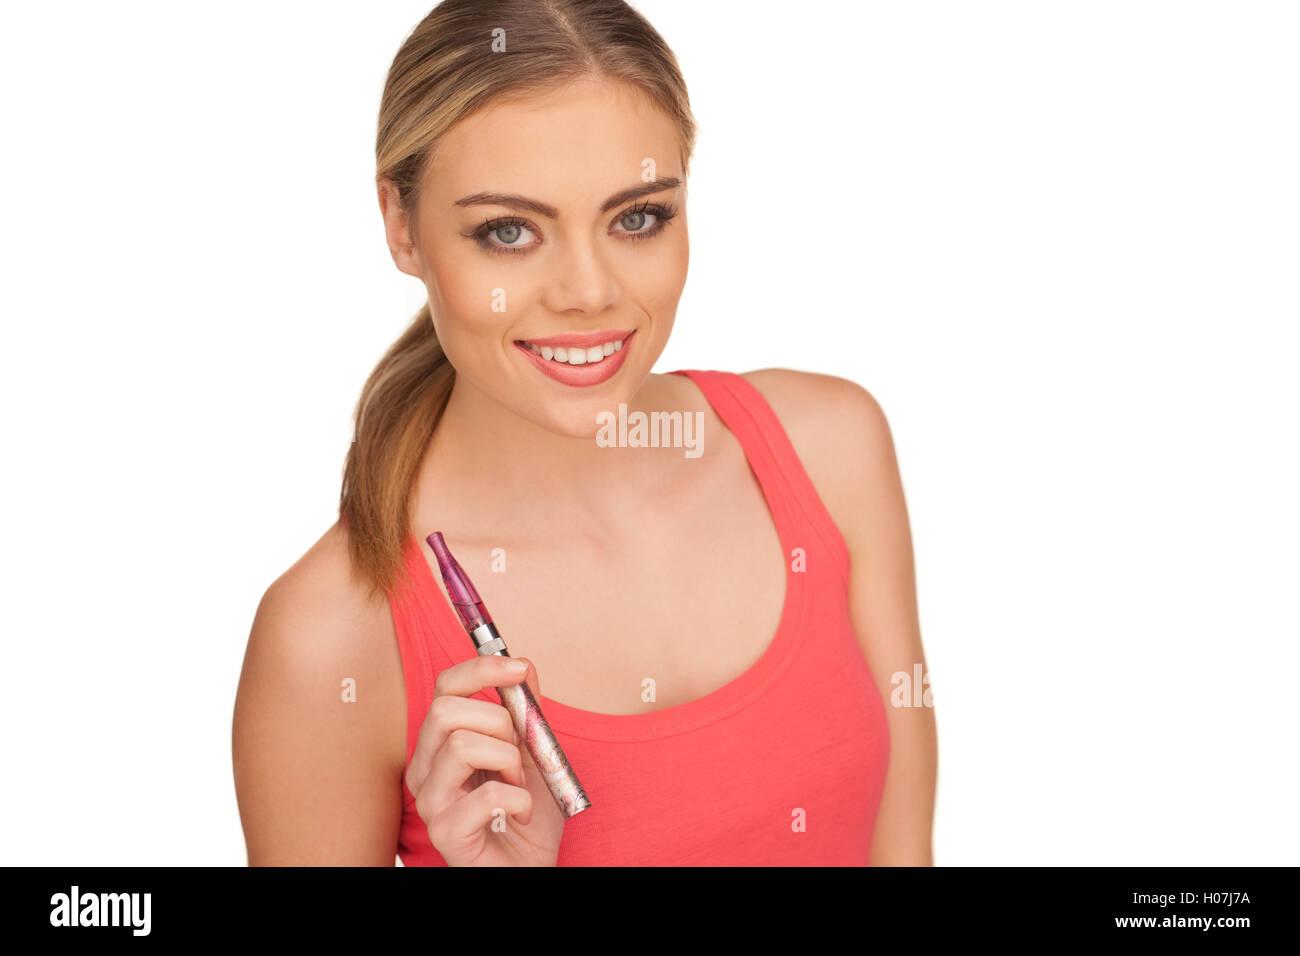 Young Woman Smokin Electic Cigarette - Stock Image